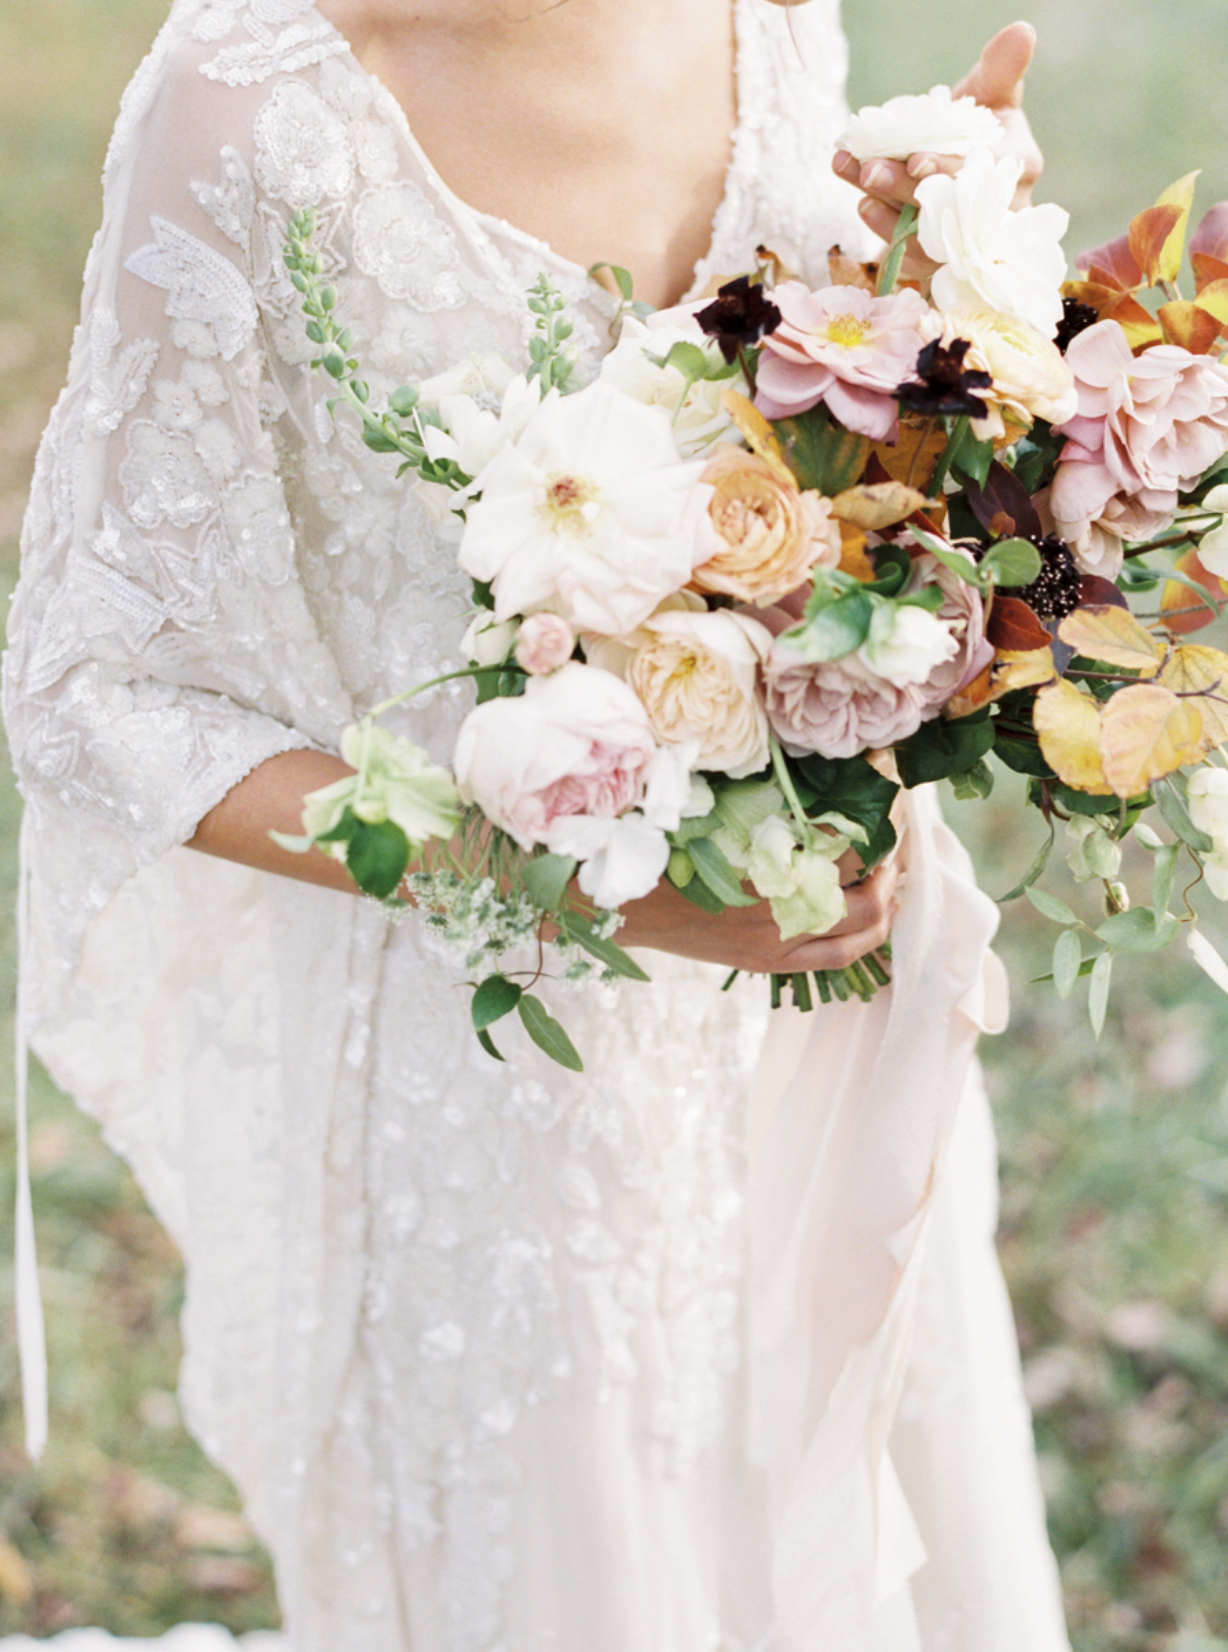 Carol Hannah Bridal Iolite Gown Shanon Moffit Photography 21.png